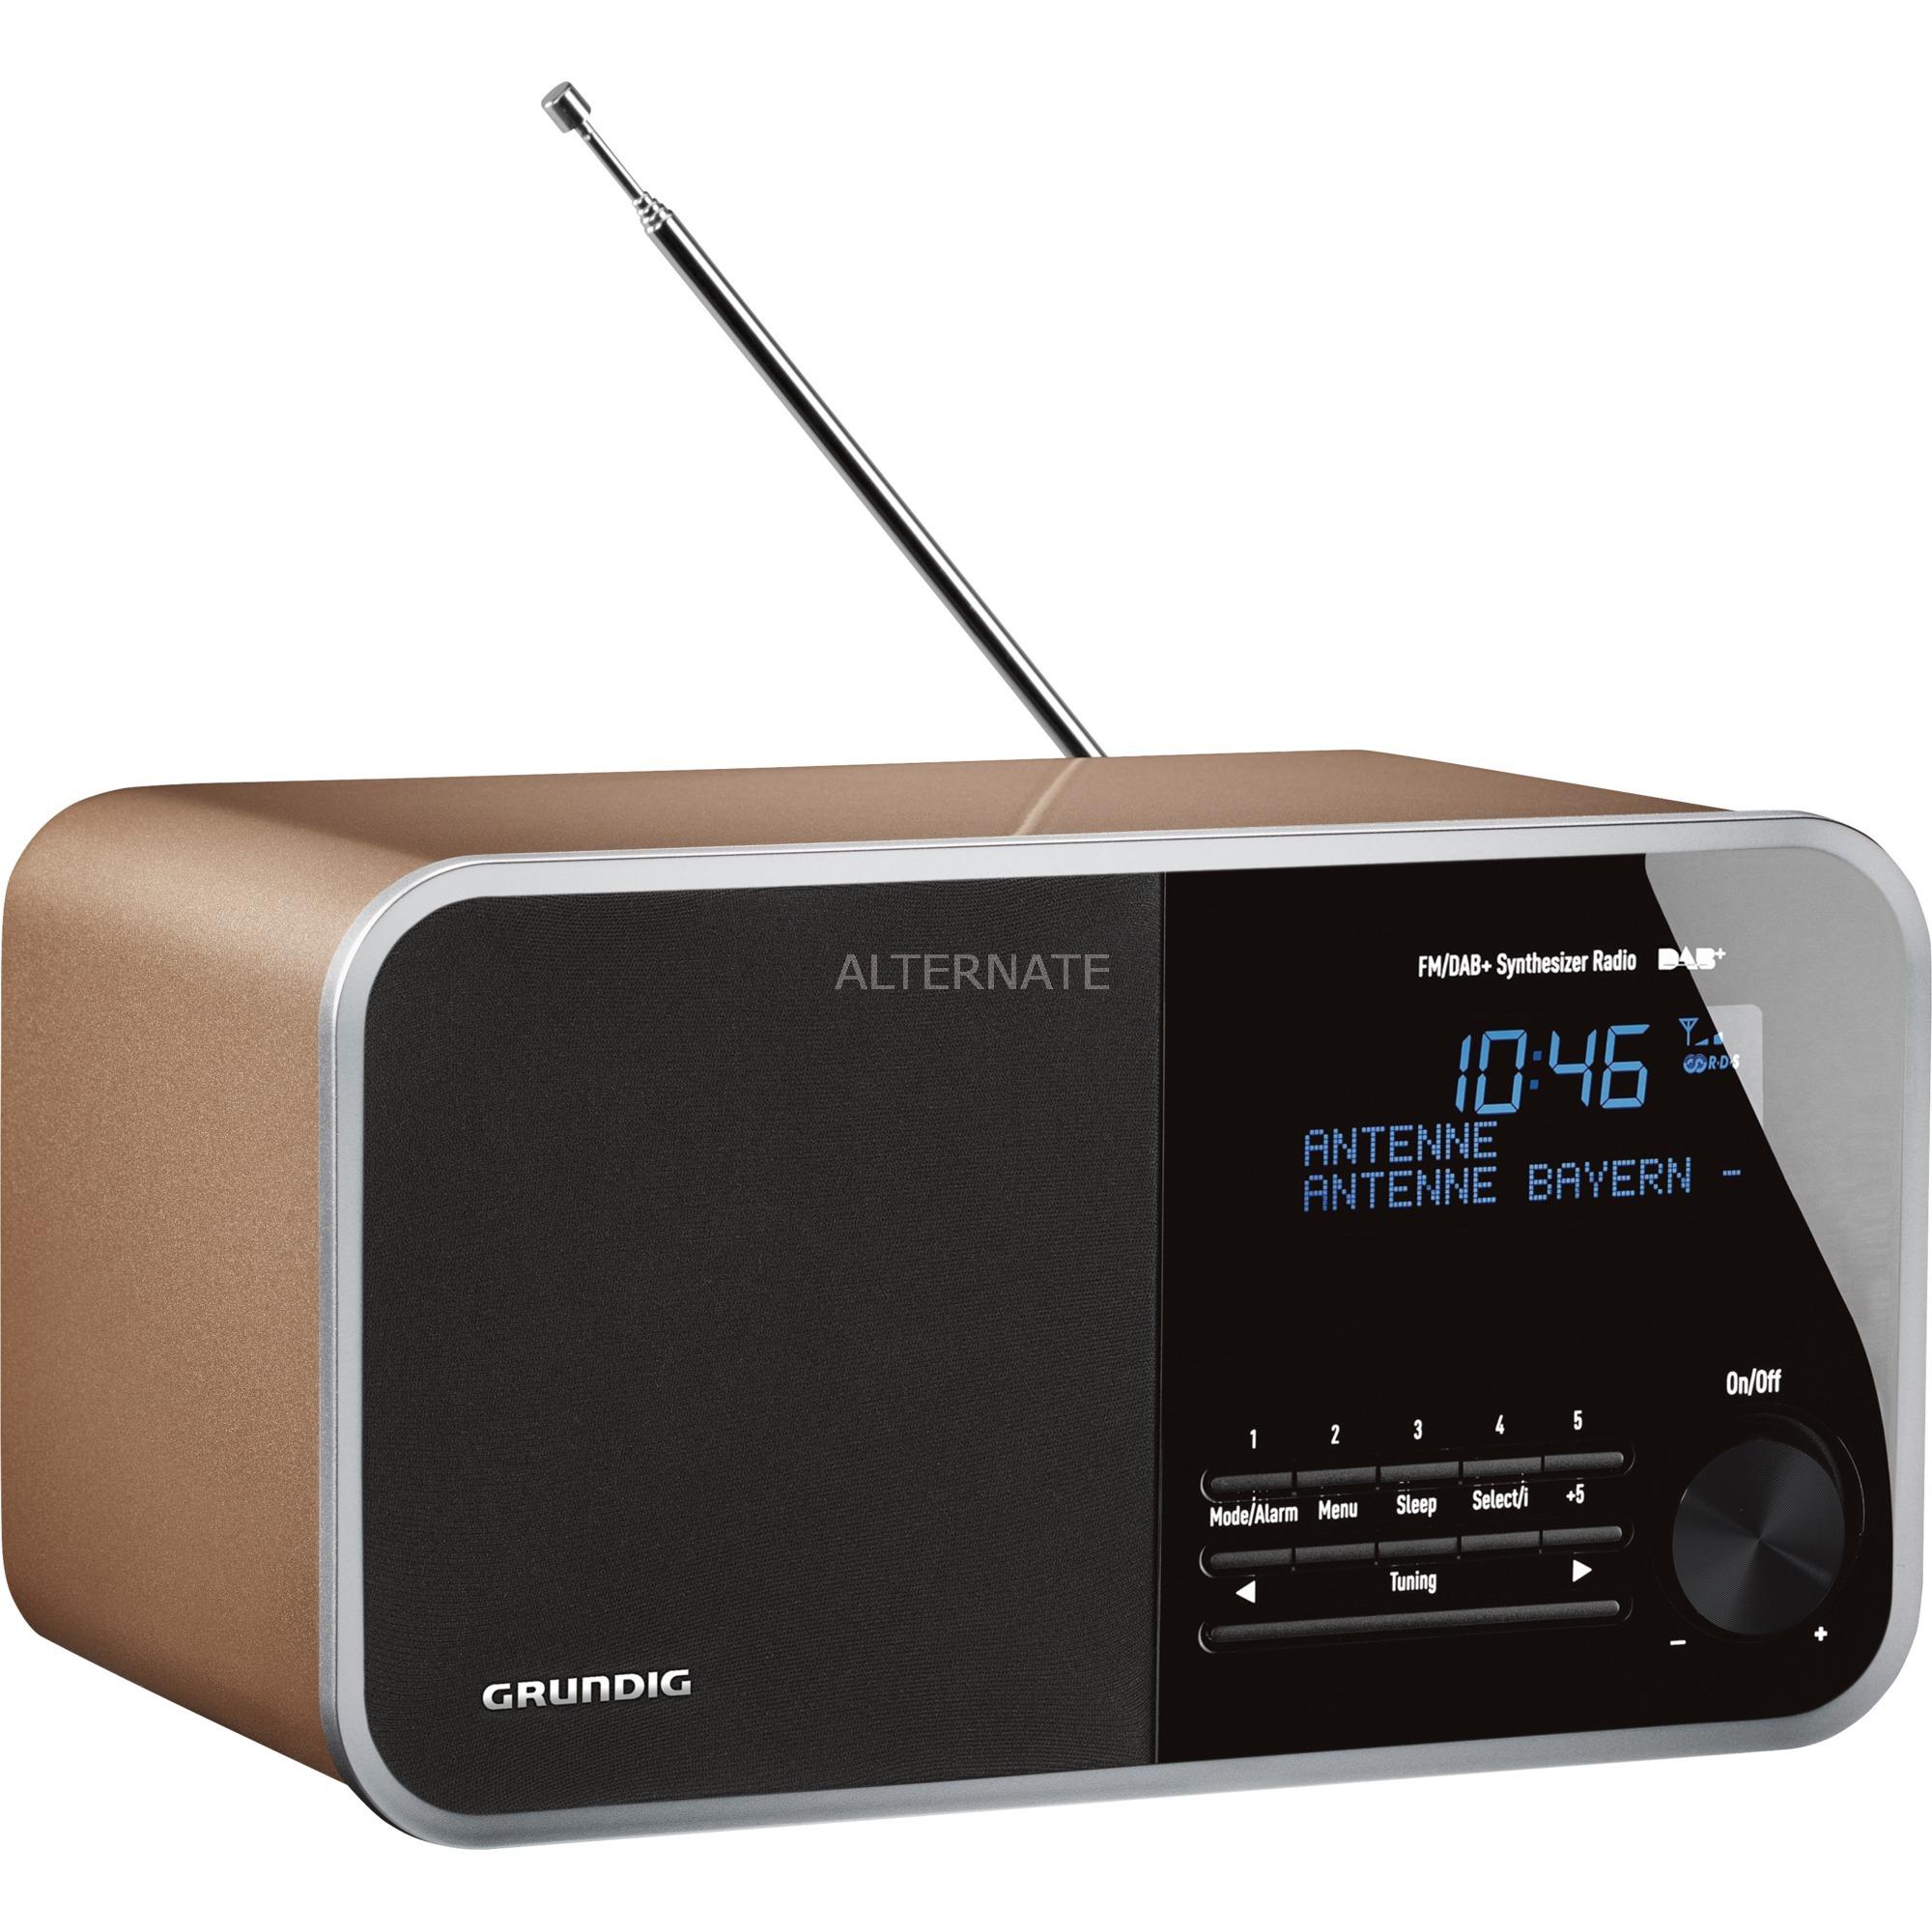 DTR 3000 DAB+ Personal Analógico y digital Champán radio